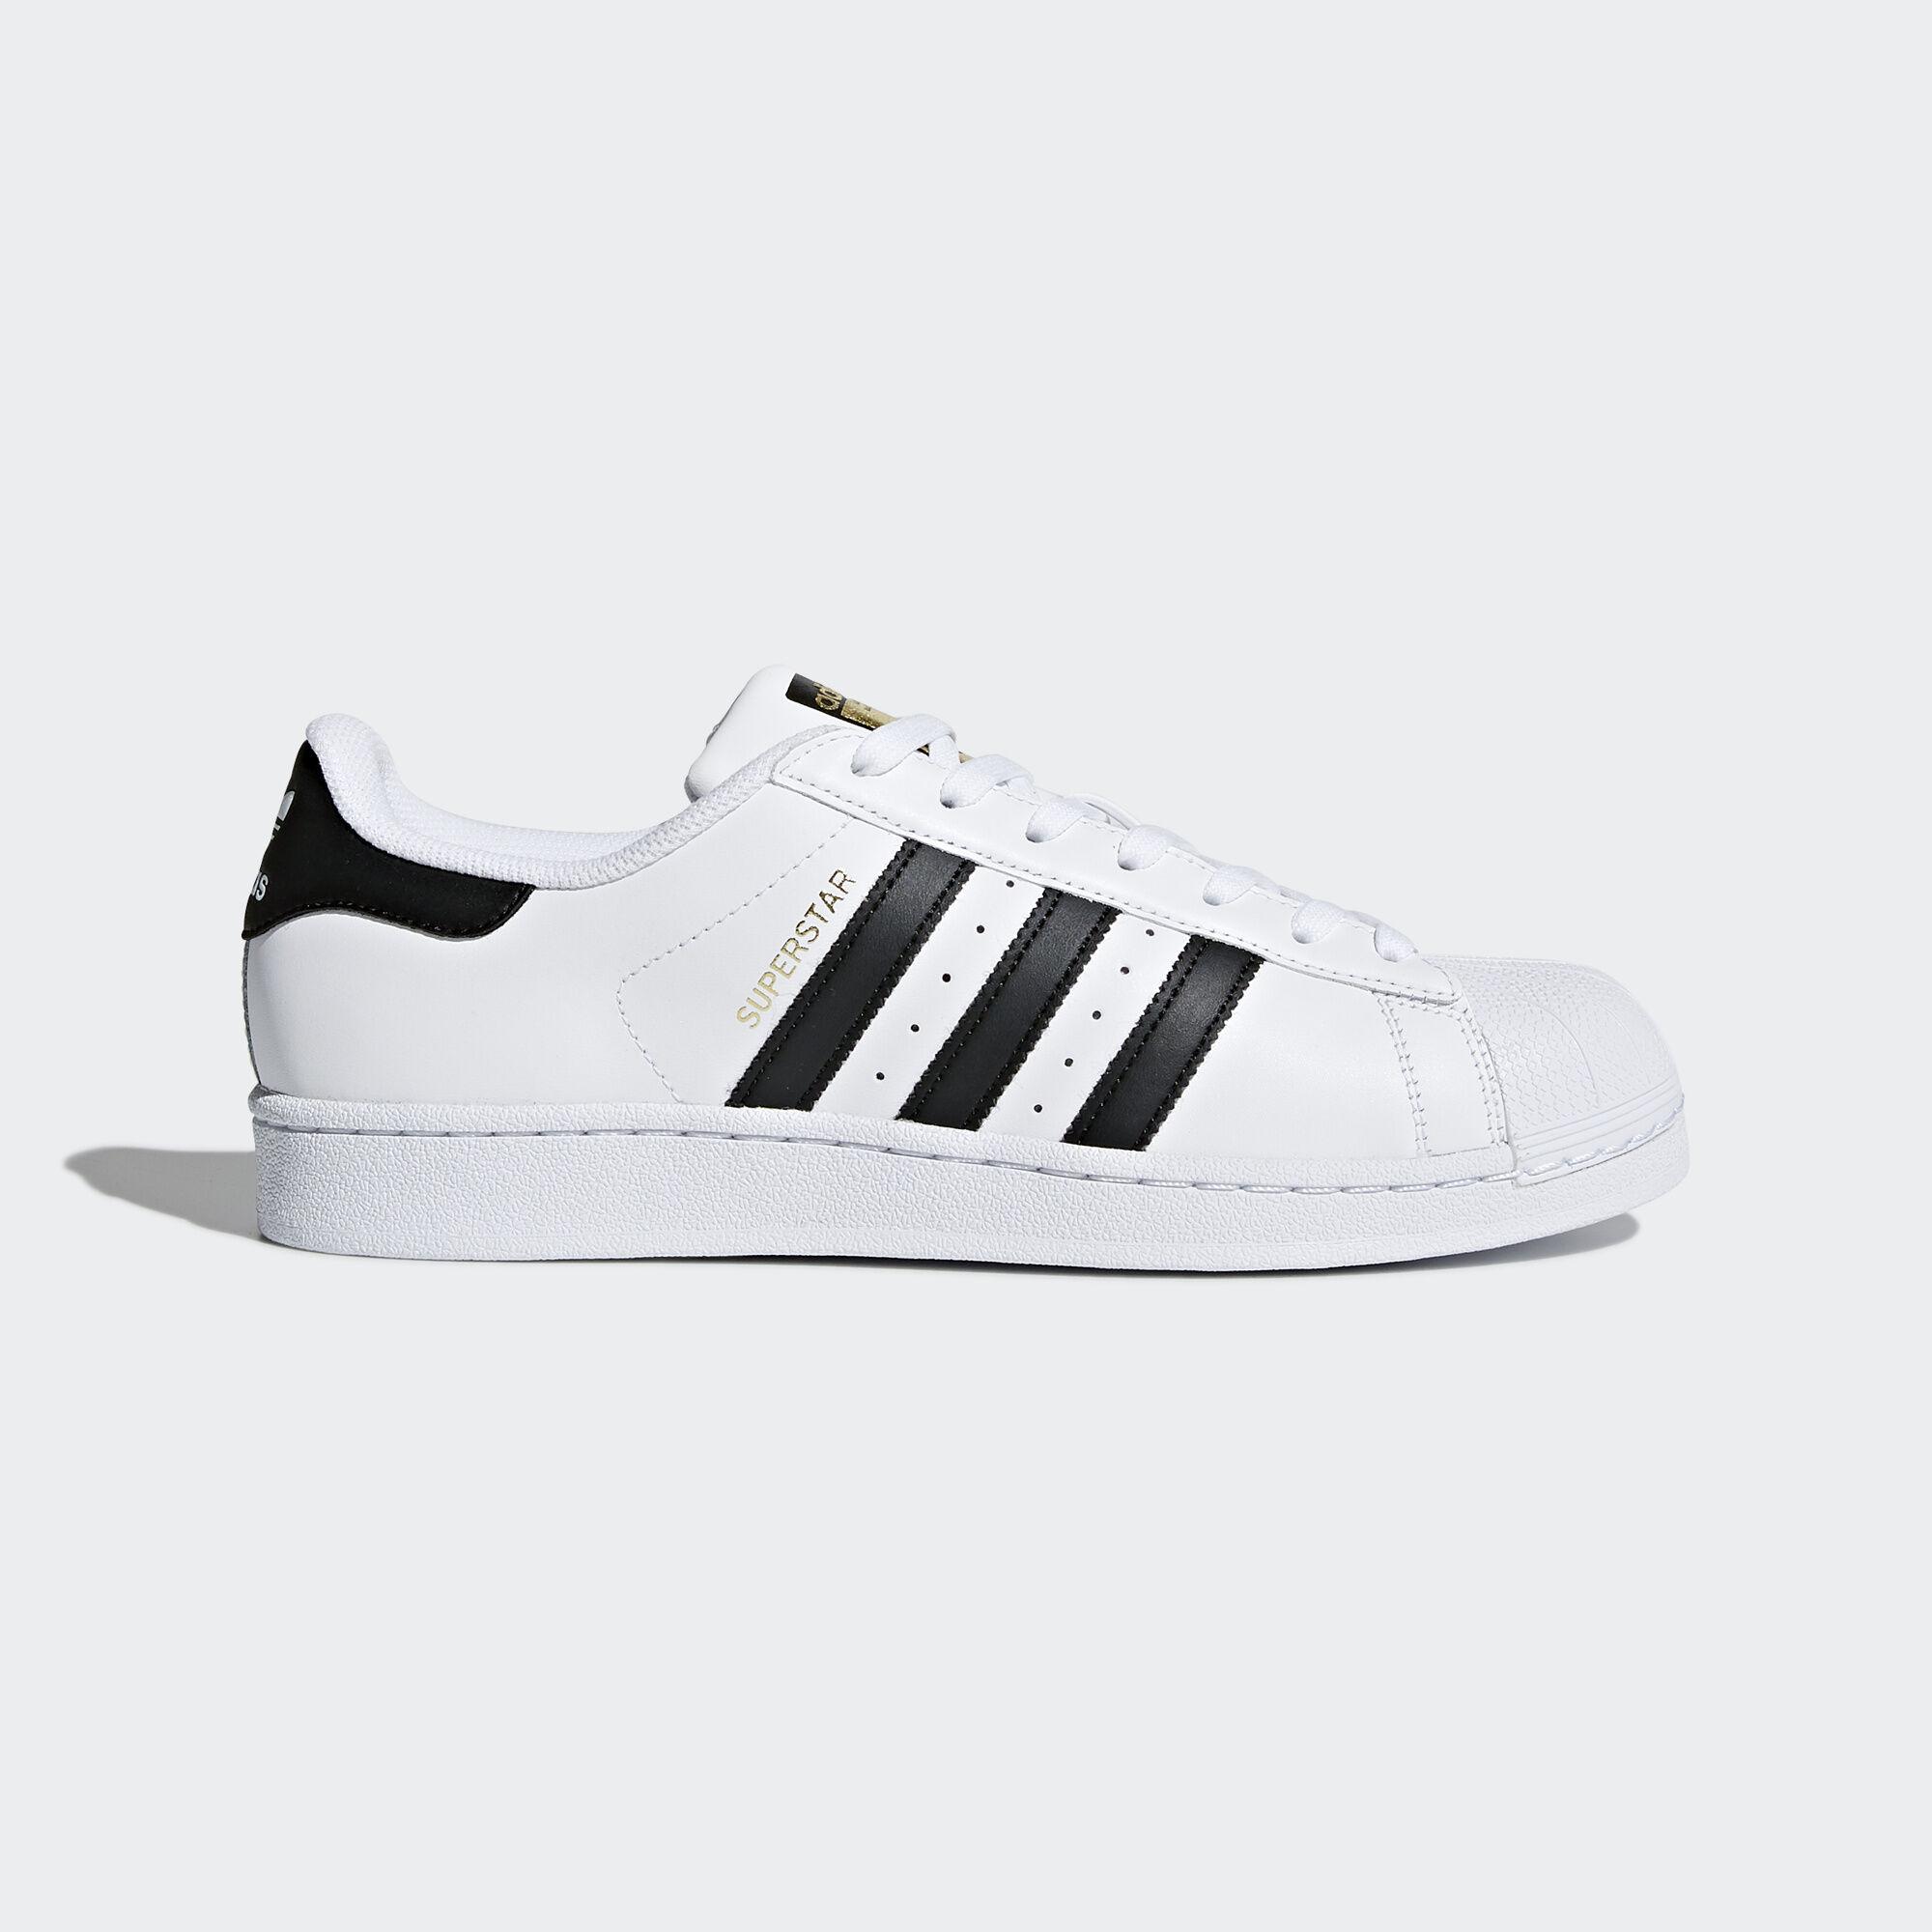 Superstar Shoes Adidas Adidas Adidas Shoes Discount Discount Adidas Superstar Discount Shoes Superstar Discount 5q3cRS4AjL